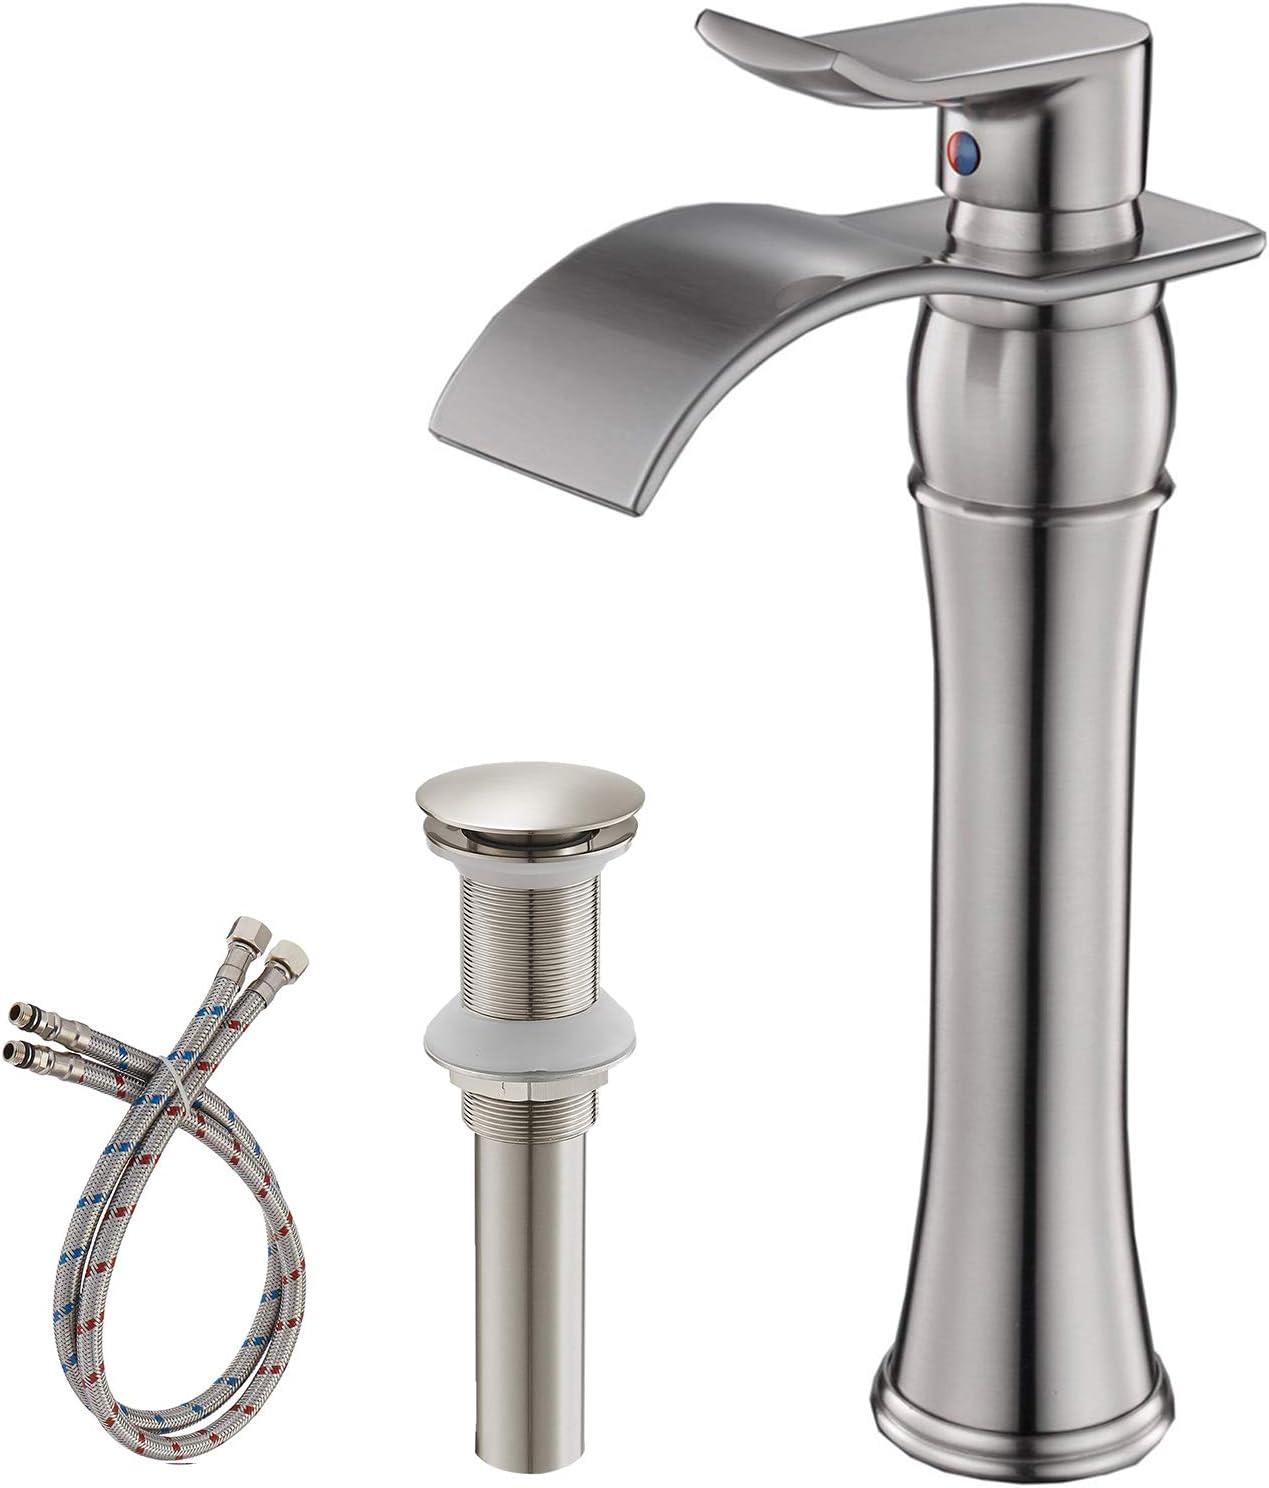 BWE Waterfall Bathroom Vessel Sink Faucet Basin Lavatory Vanity MixerTap W//Drain